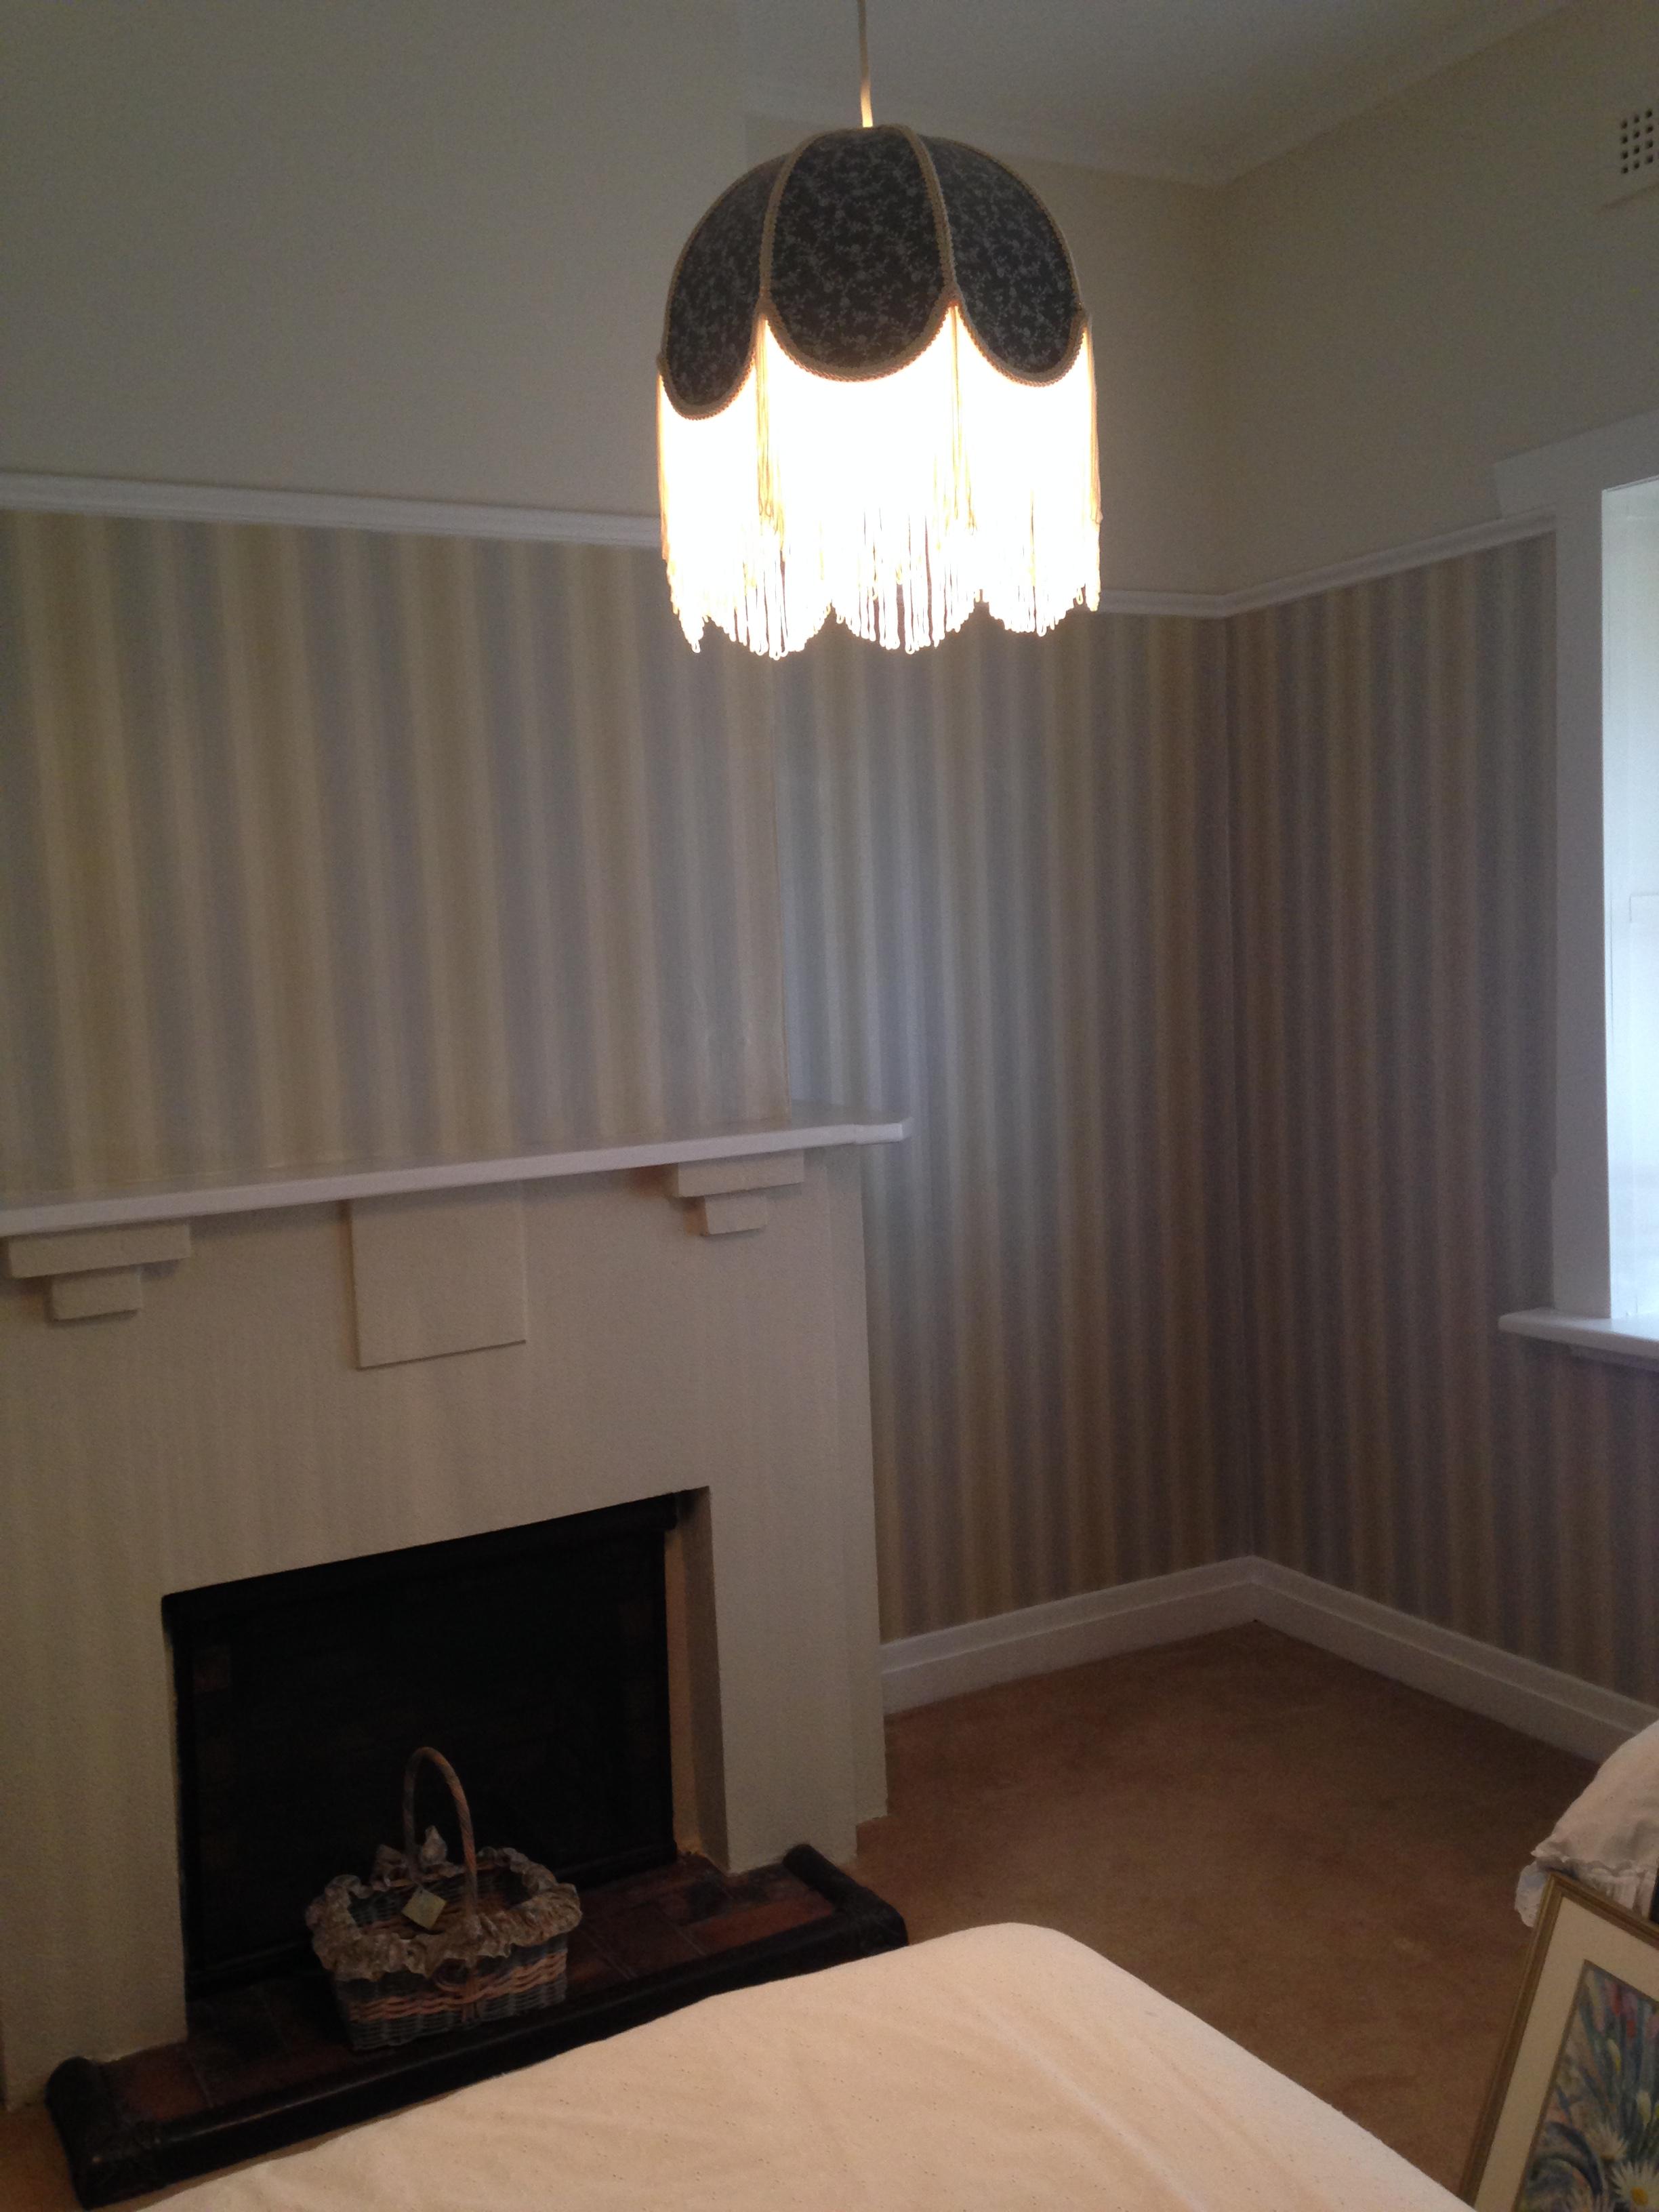 Wallpaper & picture rail